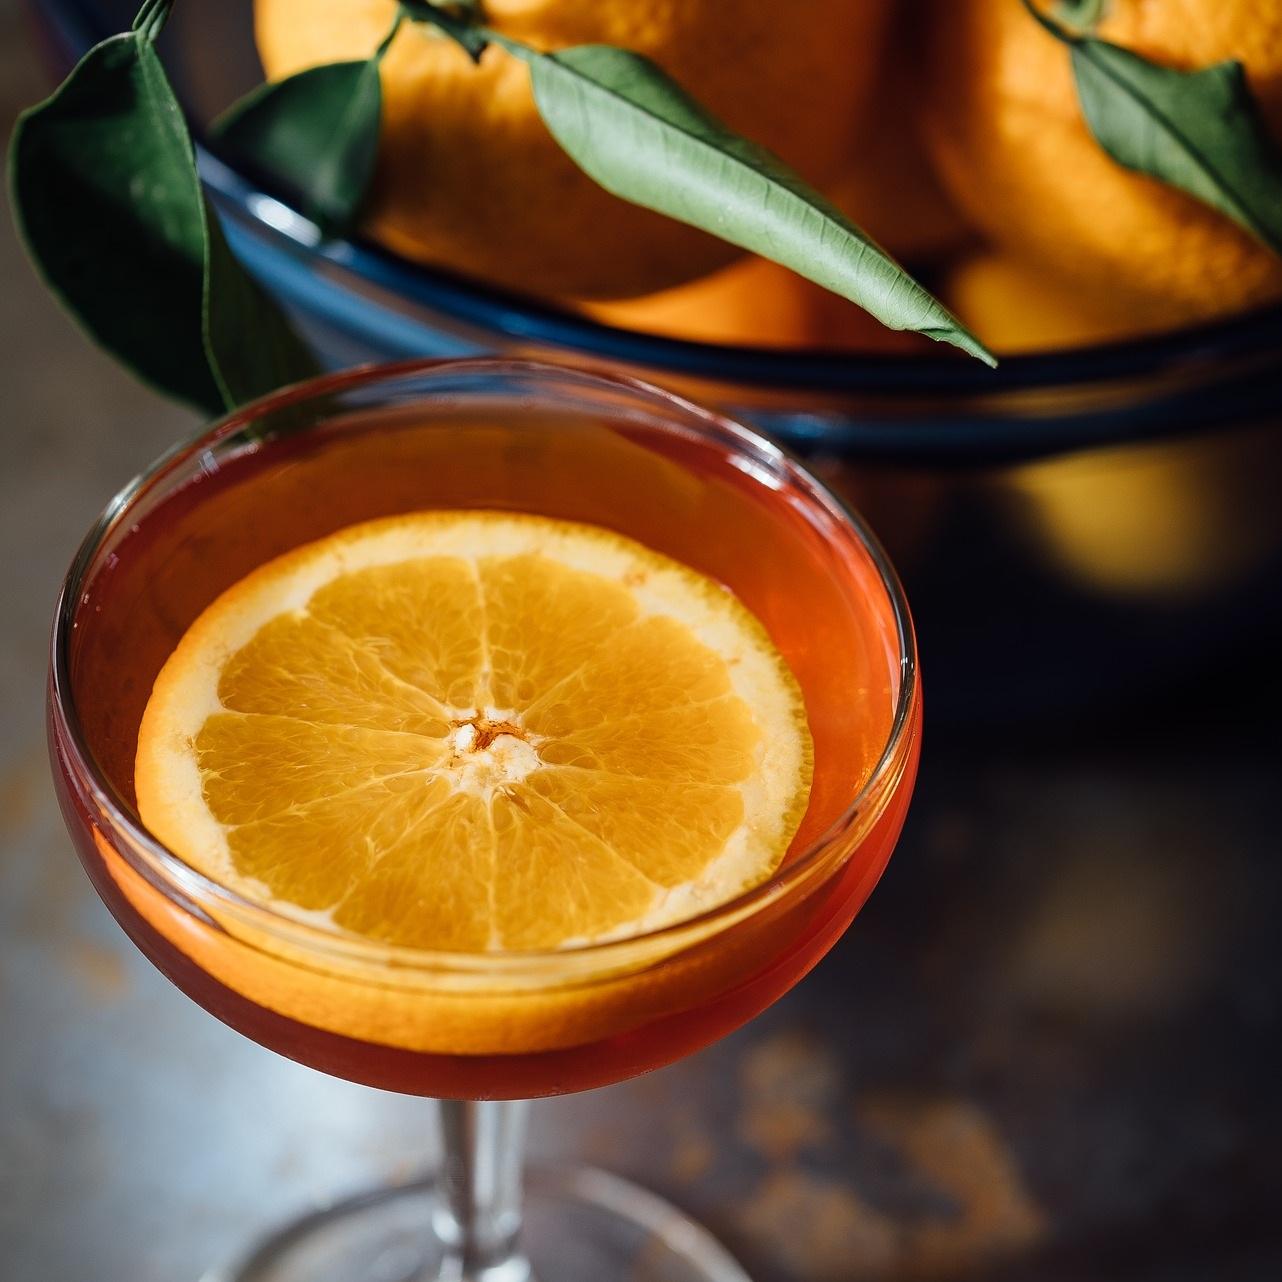 alcohol-1850038_1920.jpg